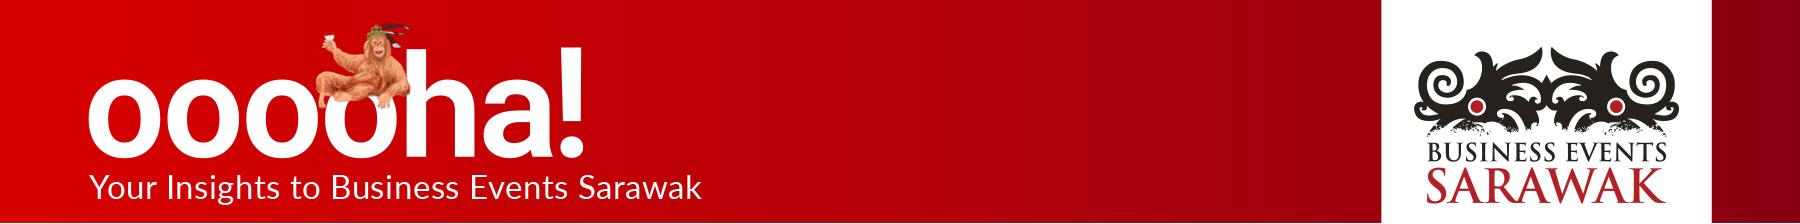 BESarawak Industry Related News – Sept 2021